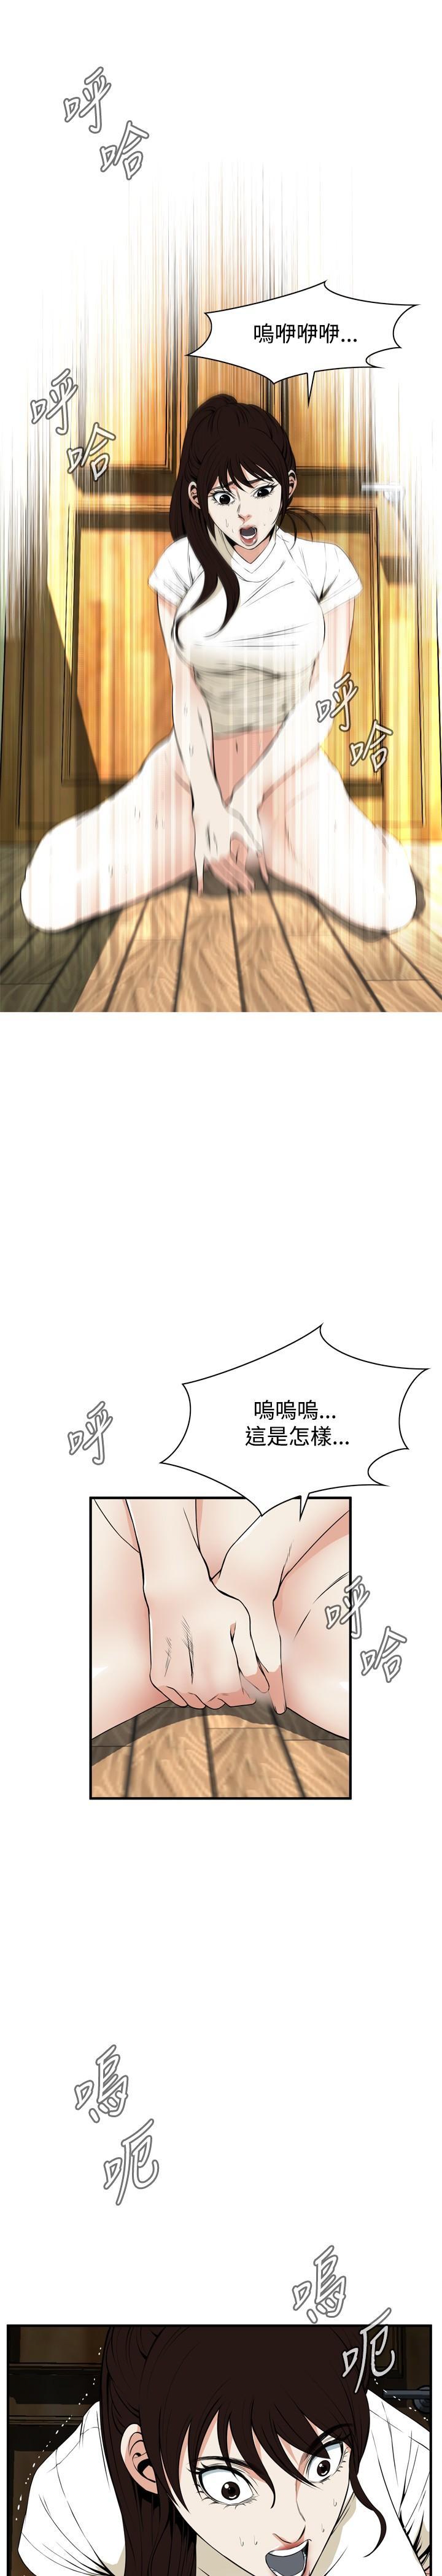 Take a Peek 偷窥 Ch.39~51 [Chinese]中文 16